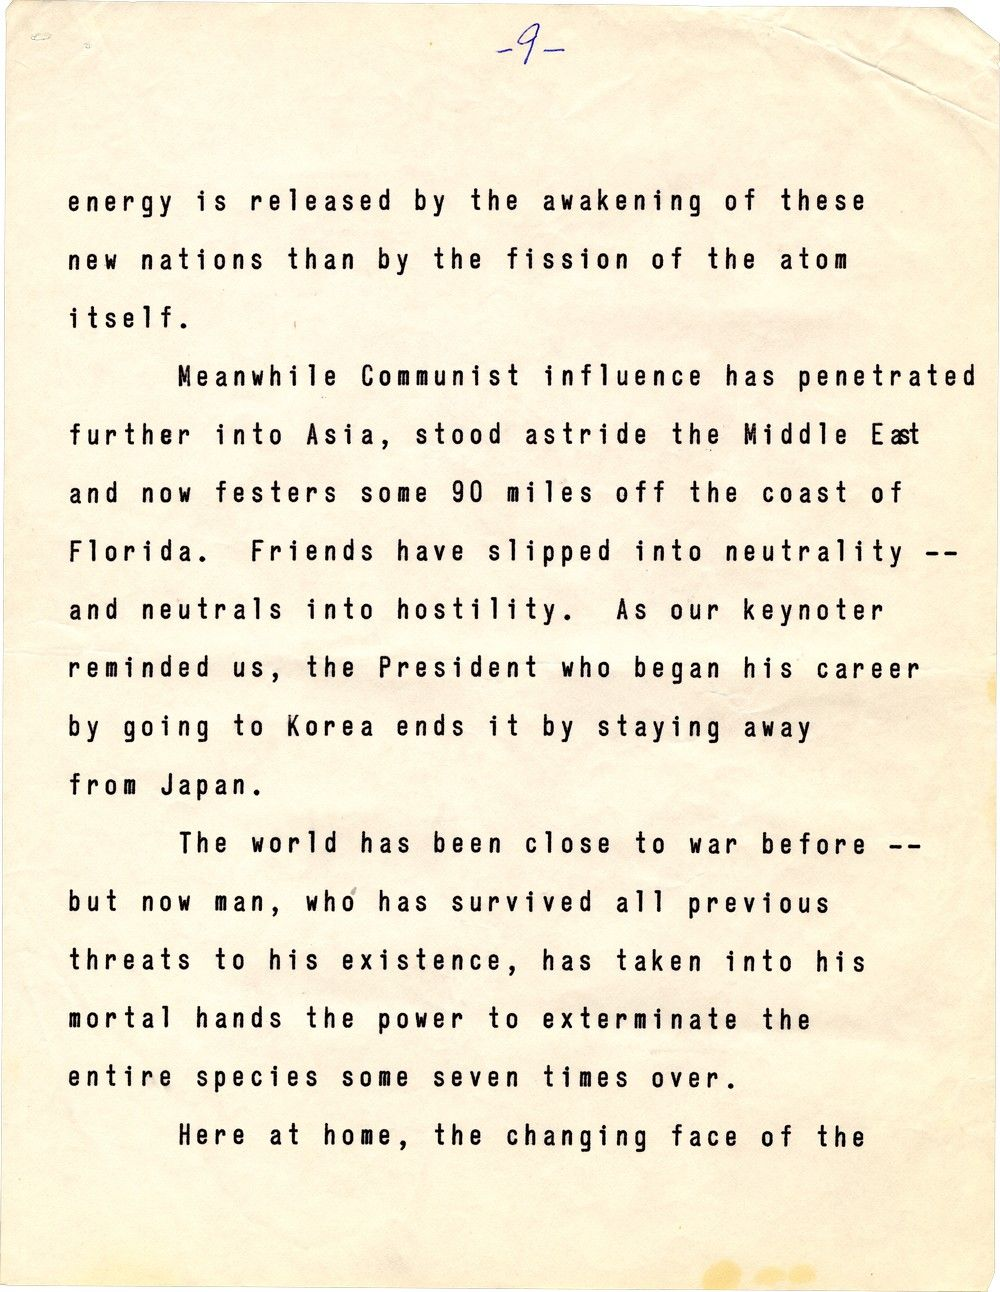 Page 9 transcript